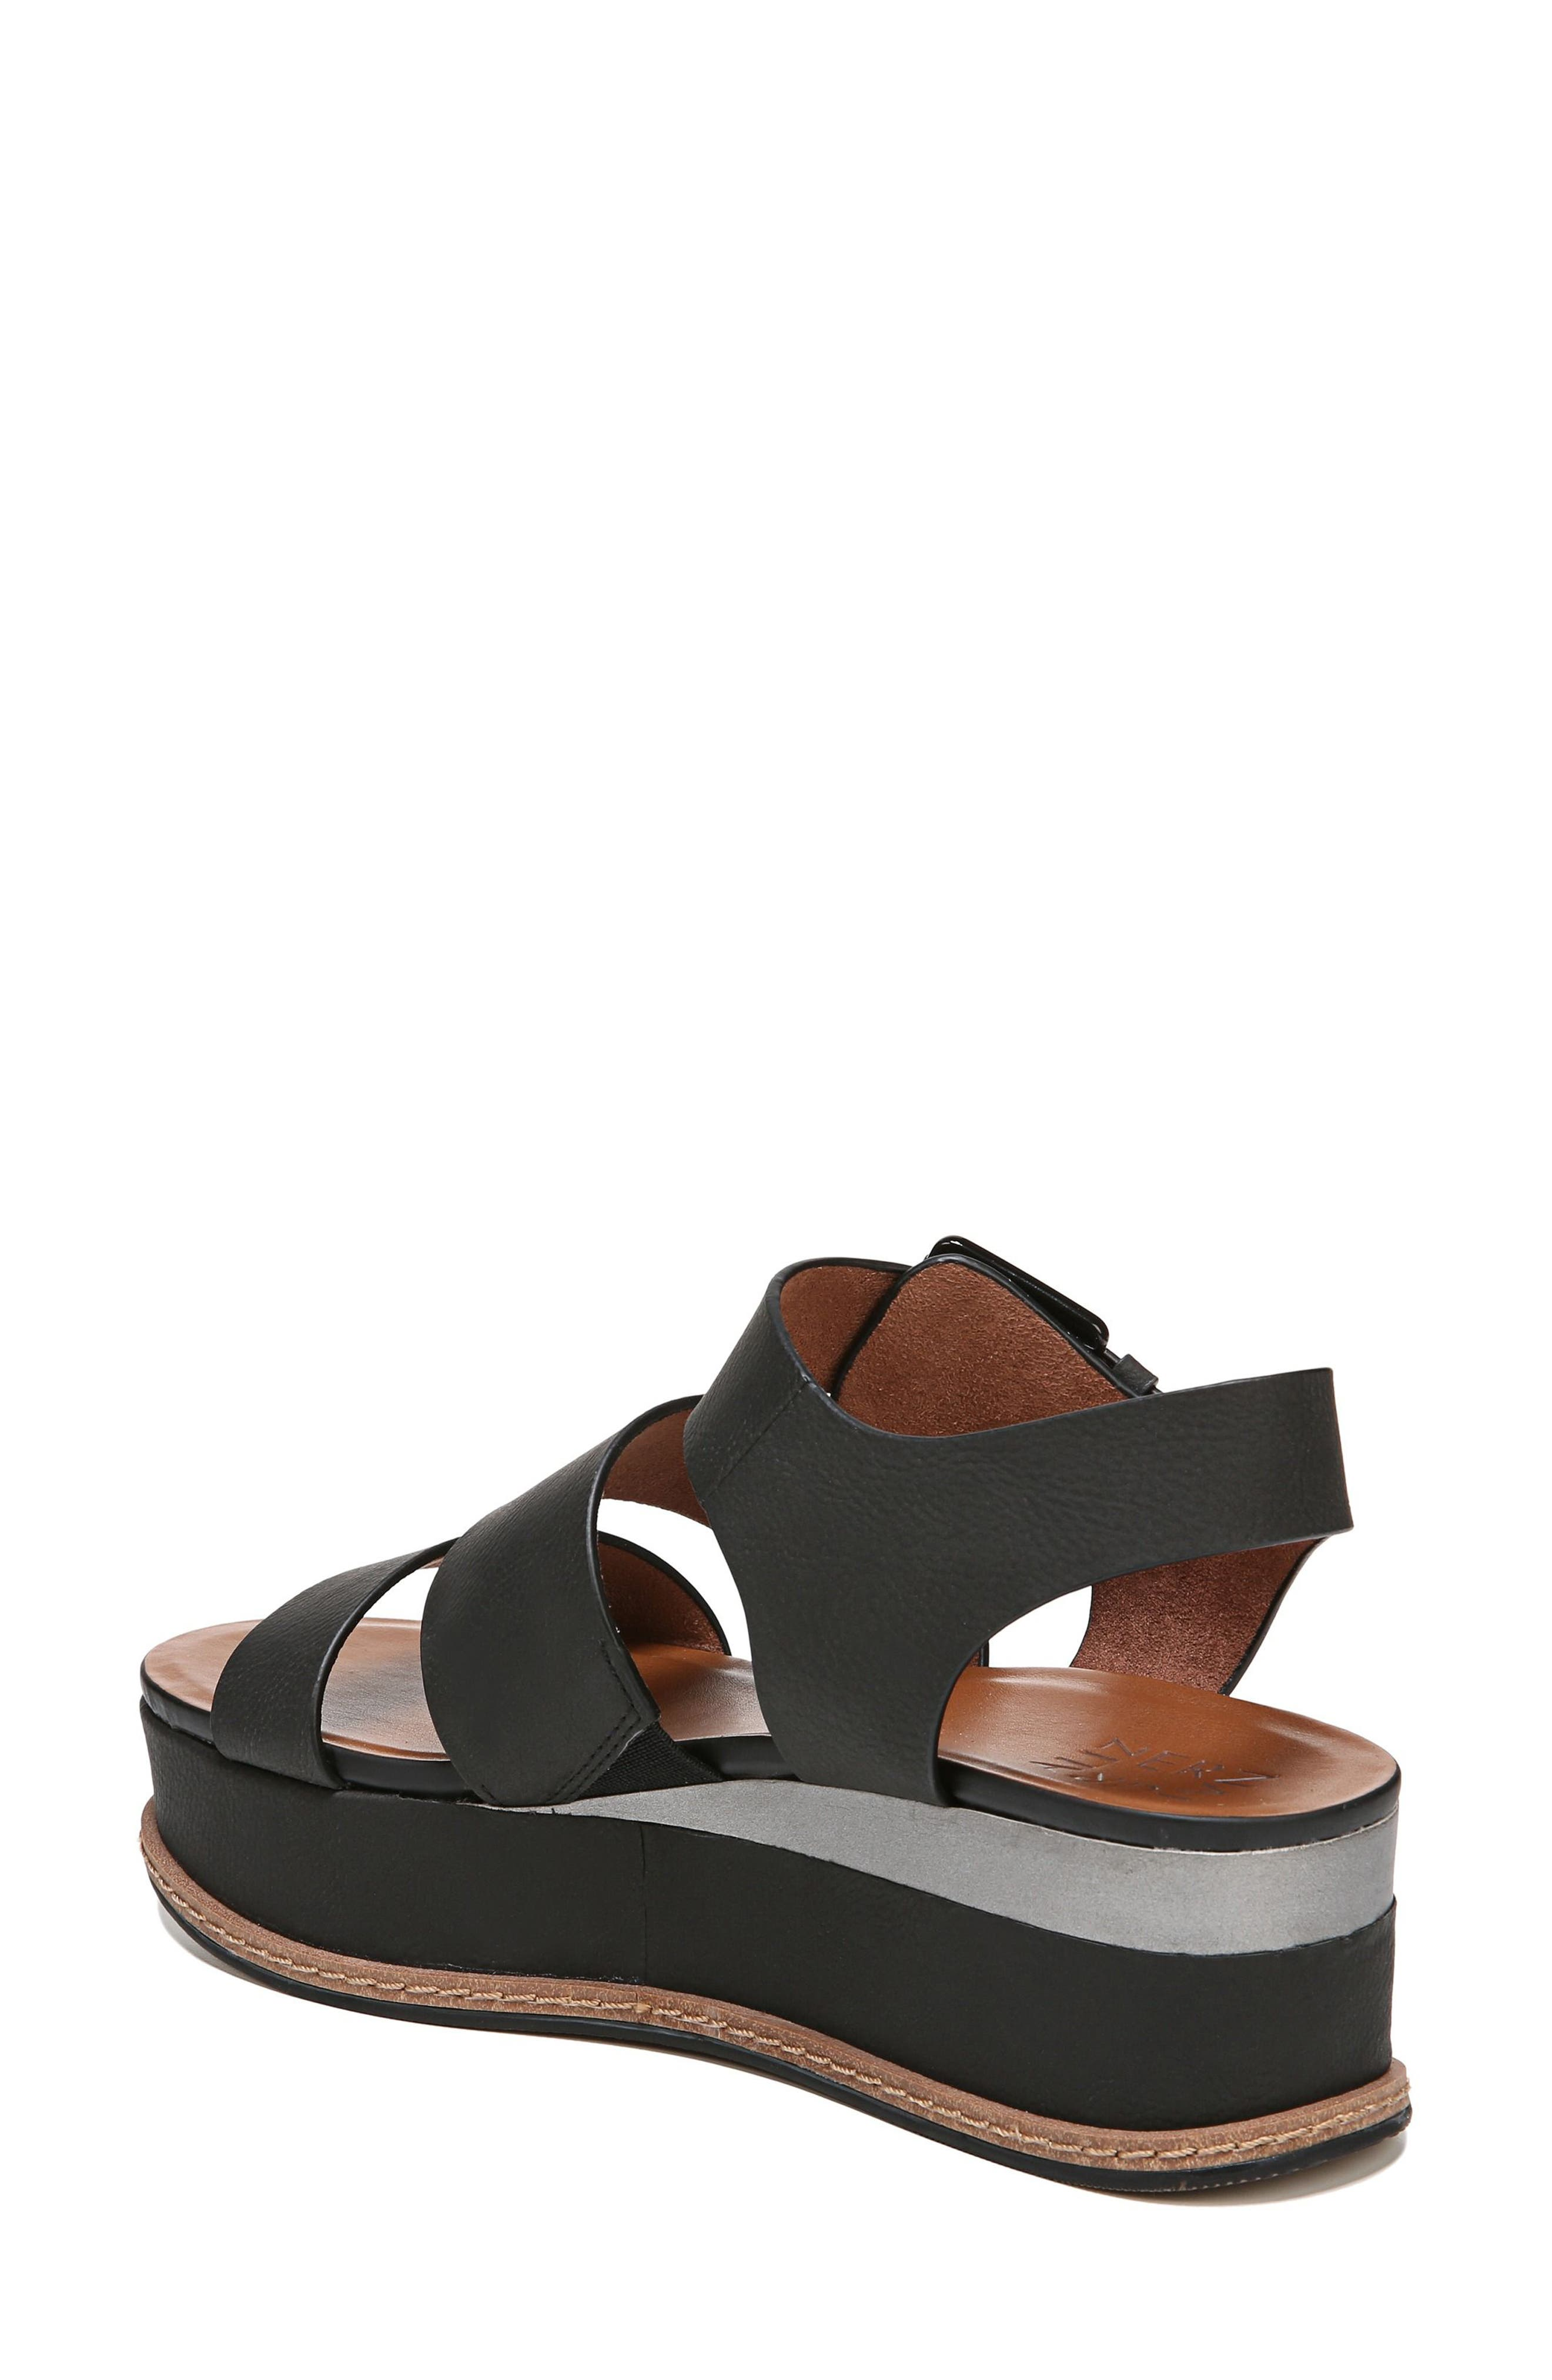 NATURALIZER, Billie Platform Sandal, Alternate thumbnail 2, color, BLACK FAUX NUBUCK LEATHER